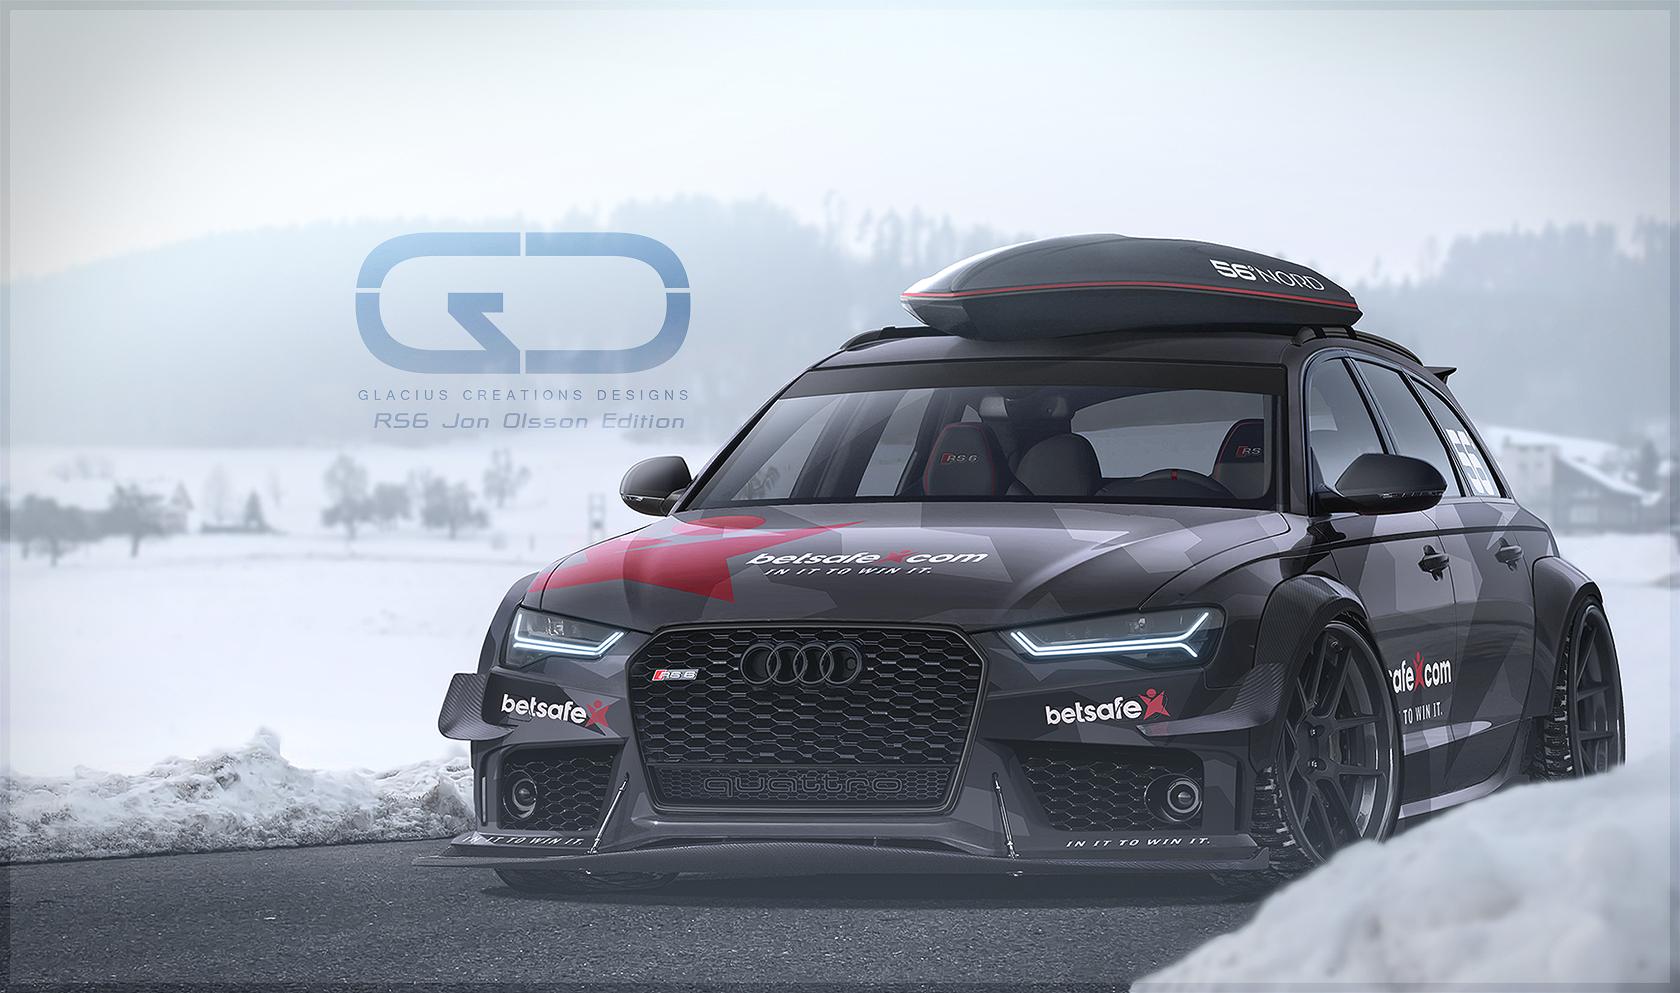 Rs6 Audi Jon Olsson Edition